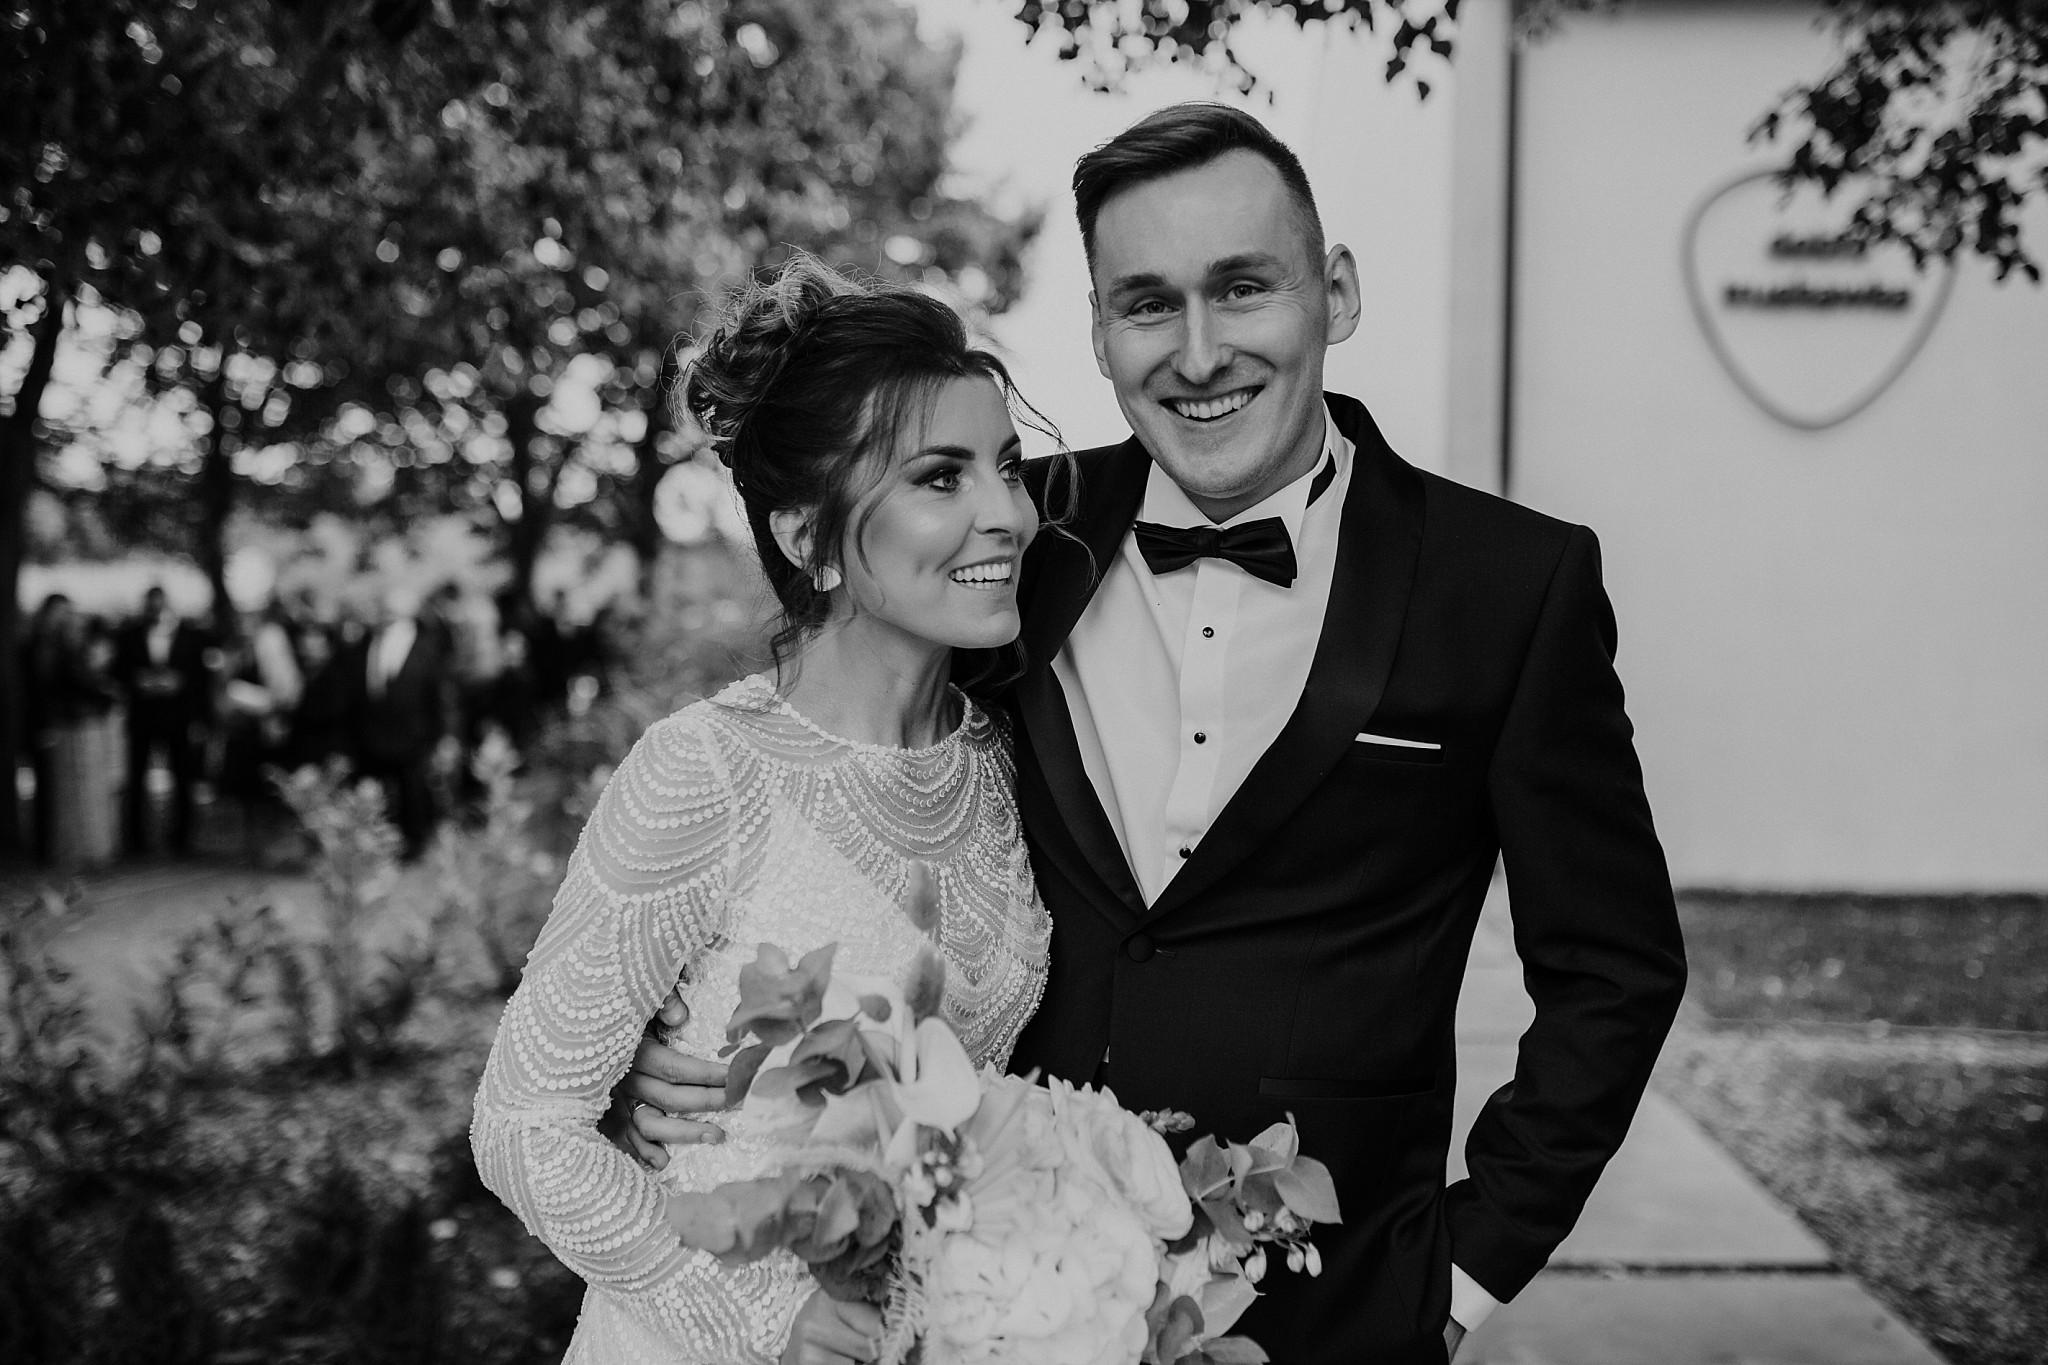 fotograf poznan wesele dobra truskawka piekne wesele pod poznaniem wesele w dobrej truskawce piekna para mloda slub marzen slub koronawirus slub listopad wesele koronawirus 256